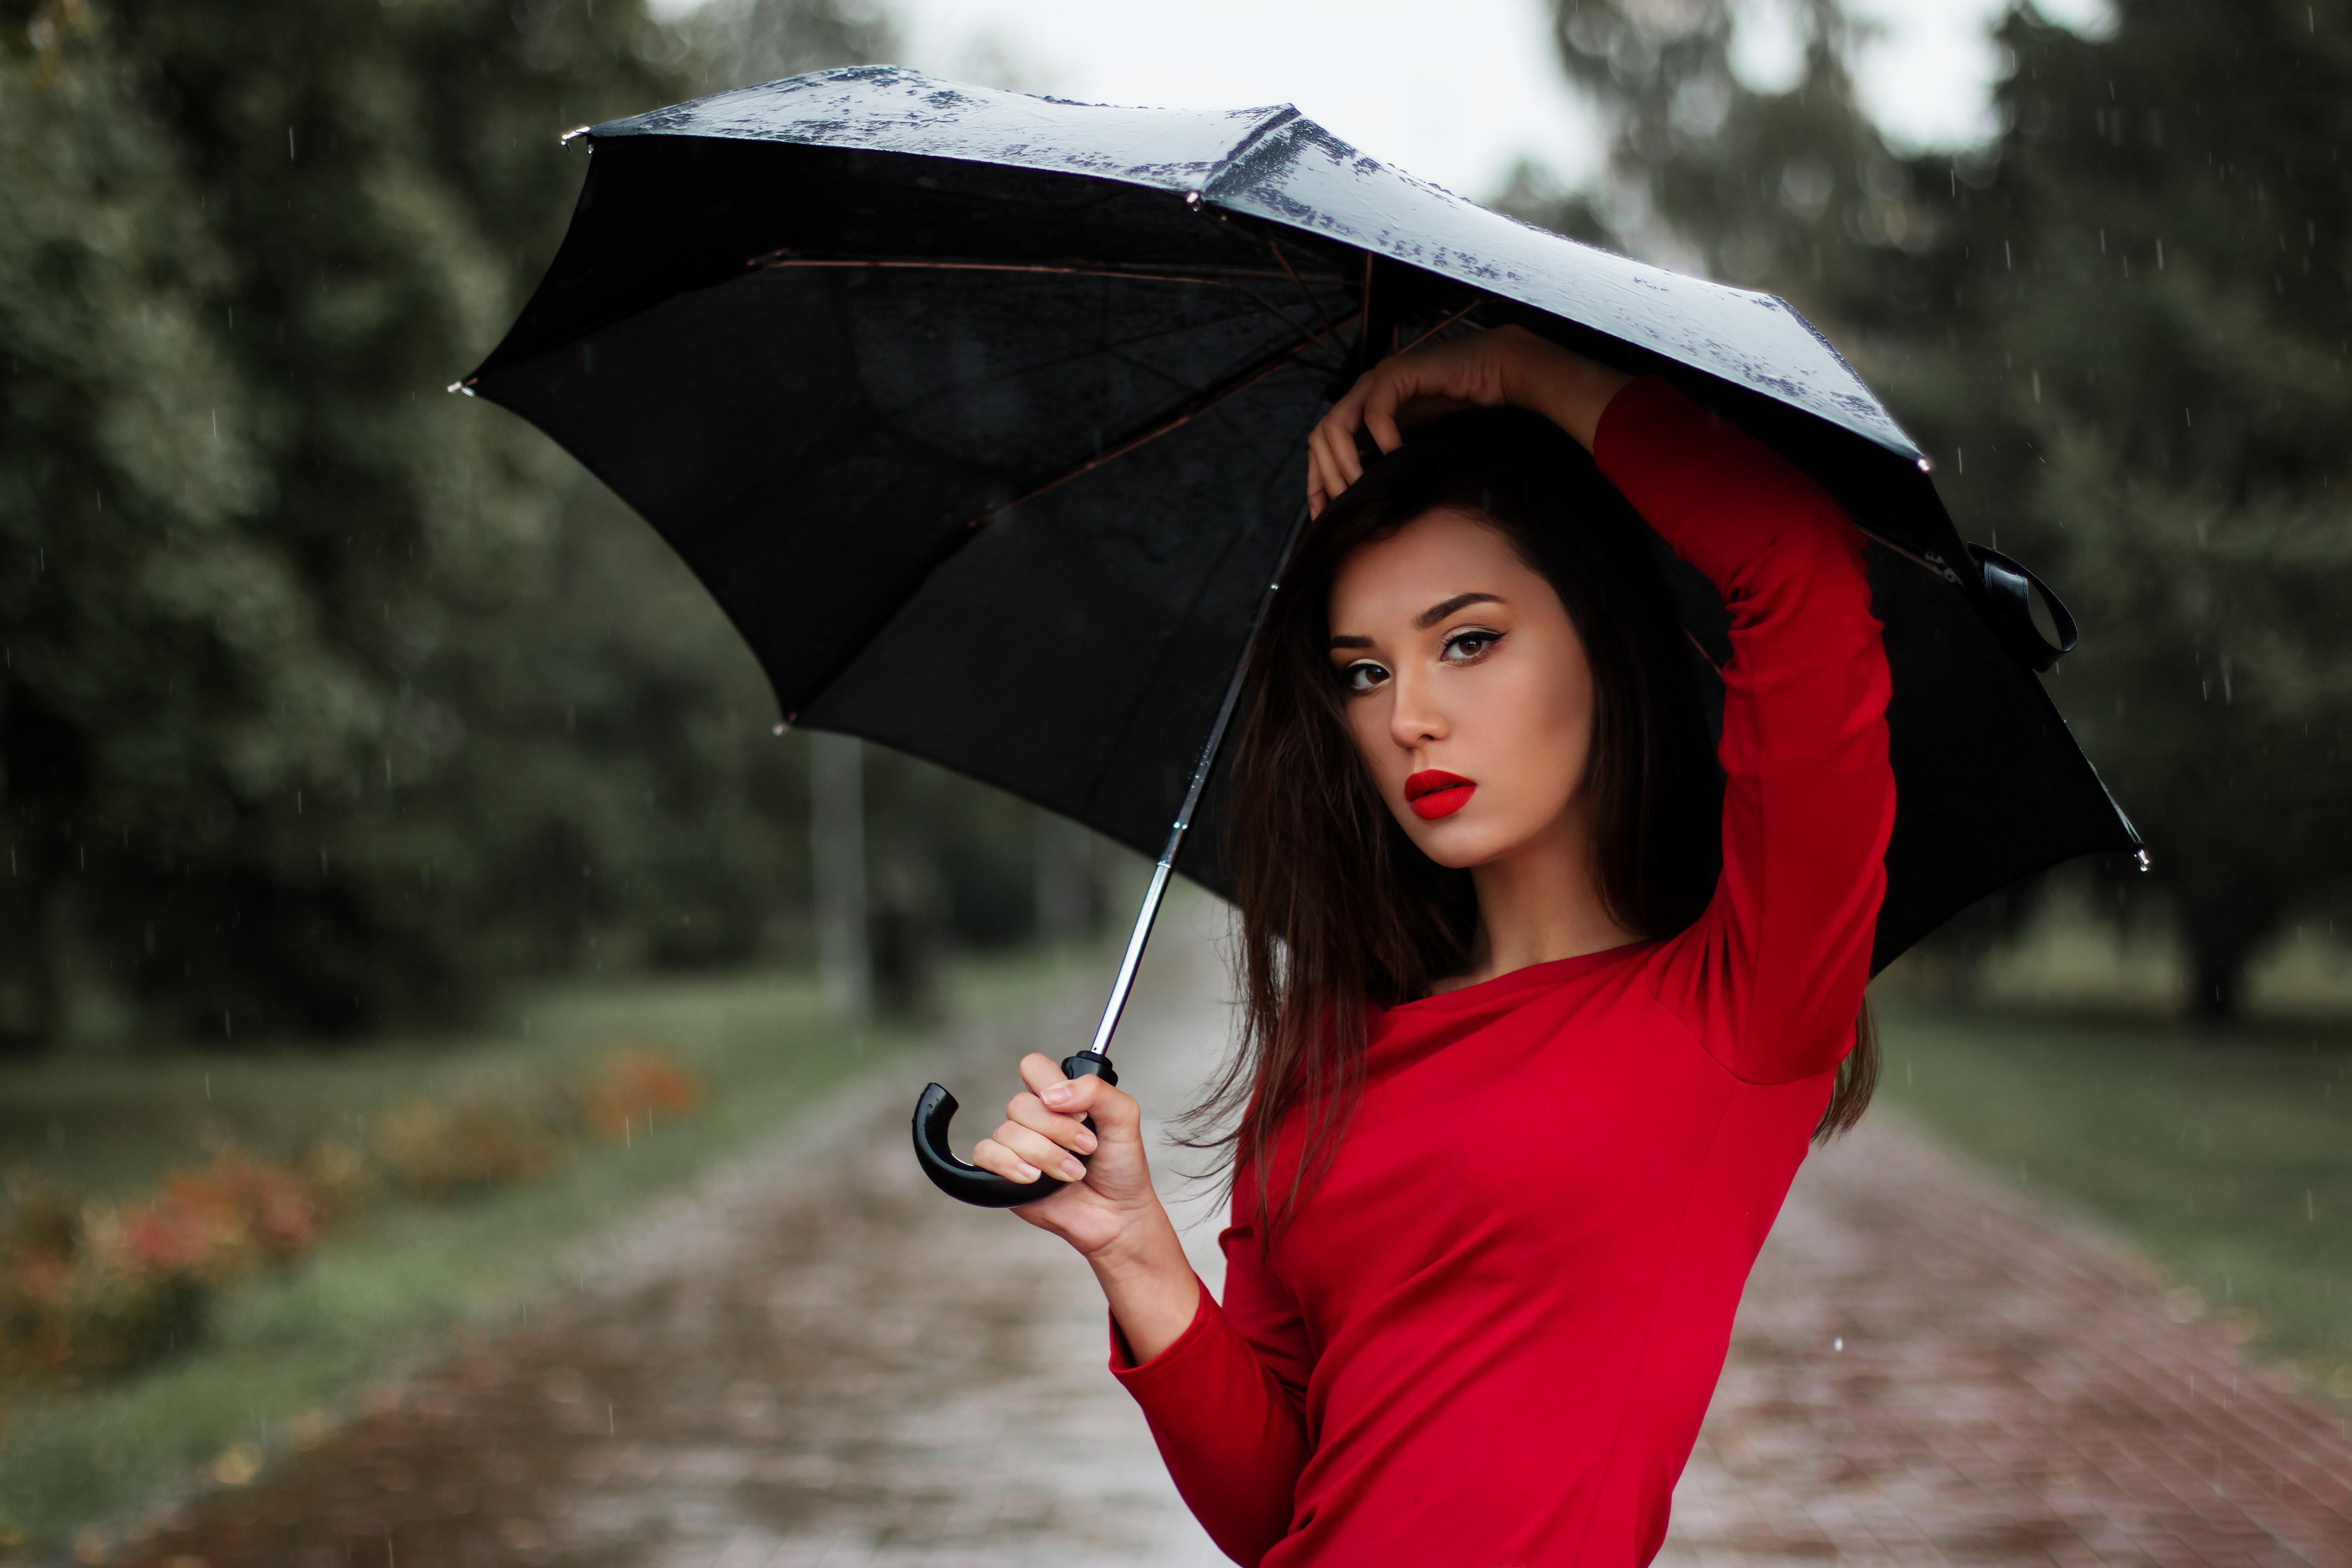 250 Amazing Umbrella Photos  Pexels  Free Stock Photos-8375